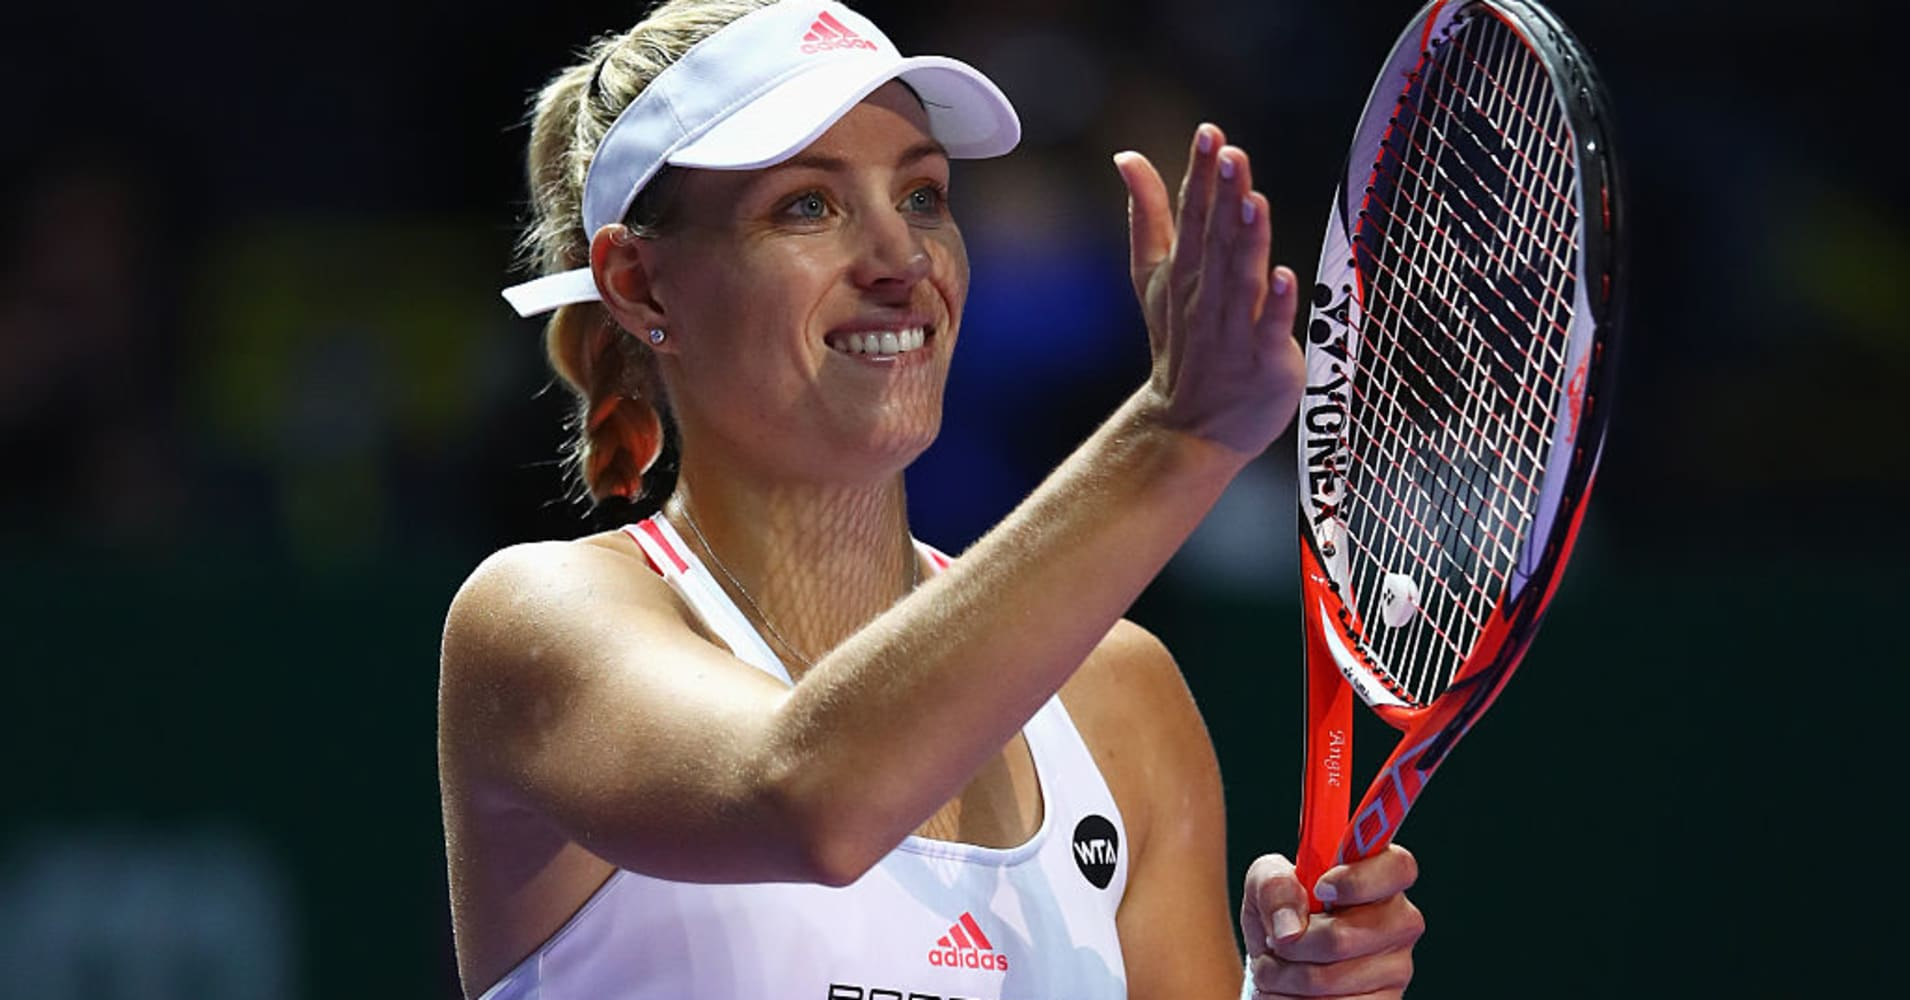 Angelique Kerber denies Serena Williams an historic win at Wimbledon